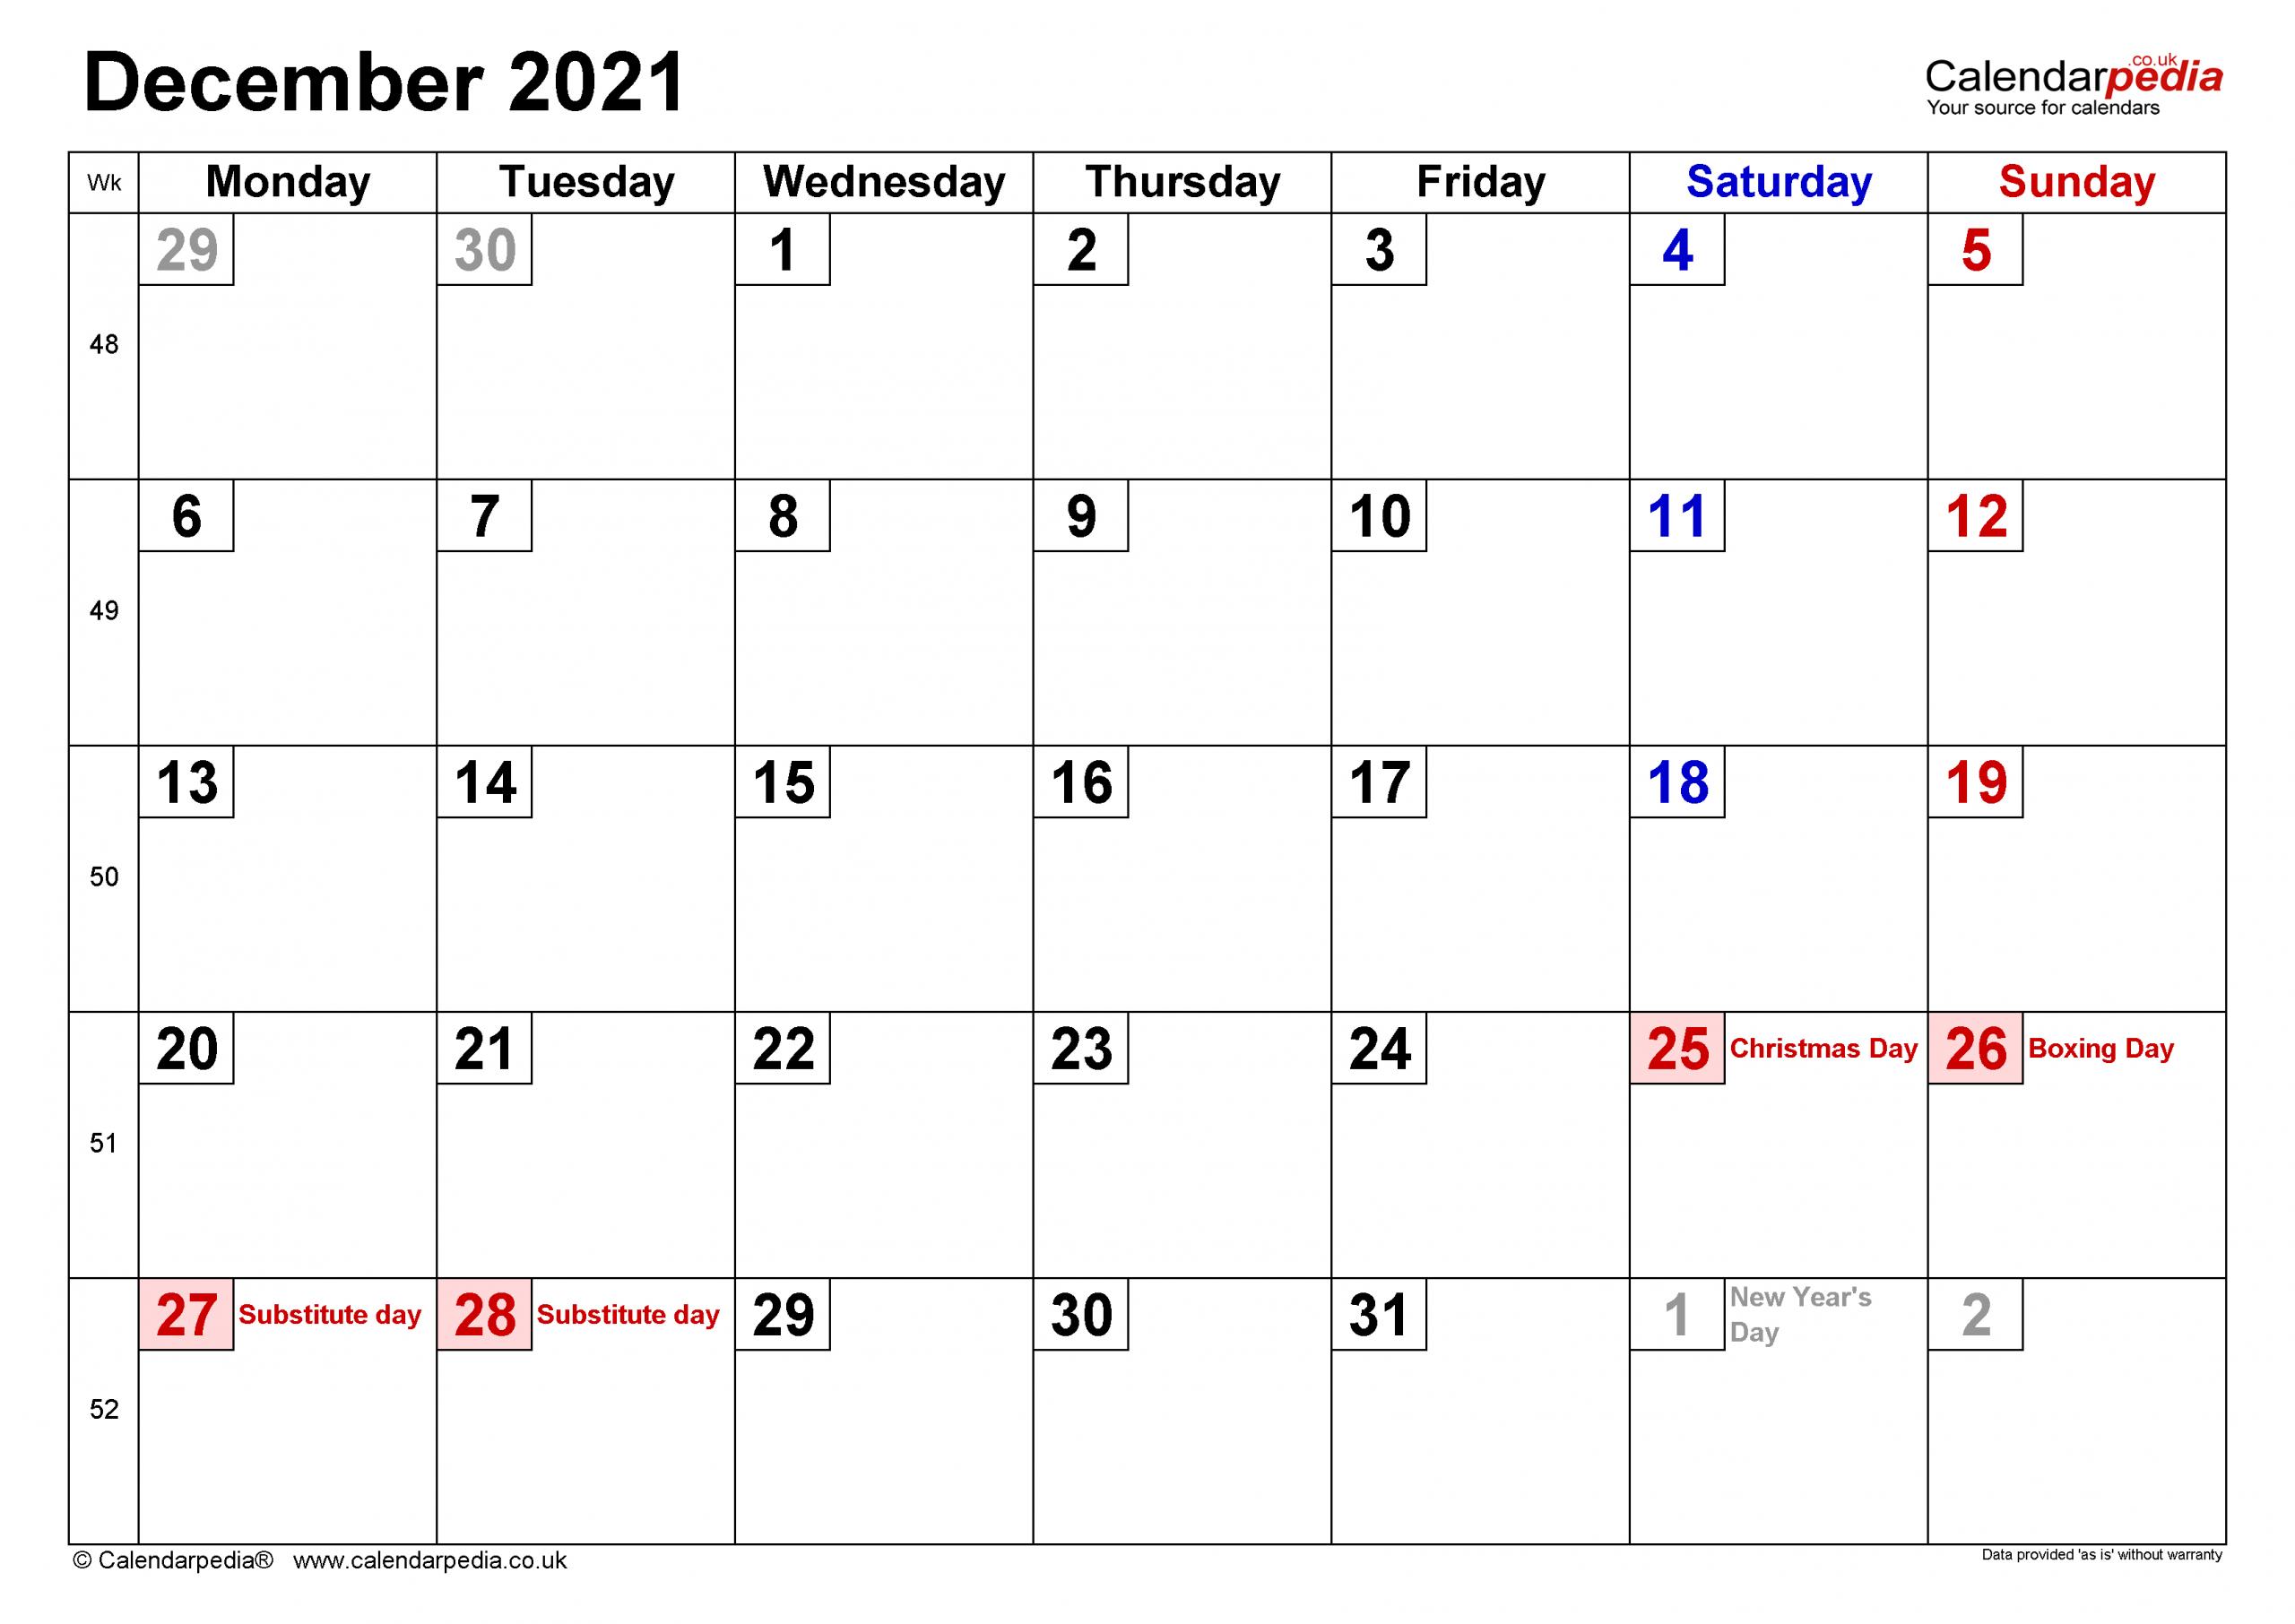 Calendar December 2021 Uk With Excel, Word And Pdf Templates December 2021 Calendar Printable Free